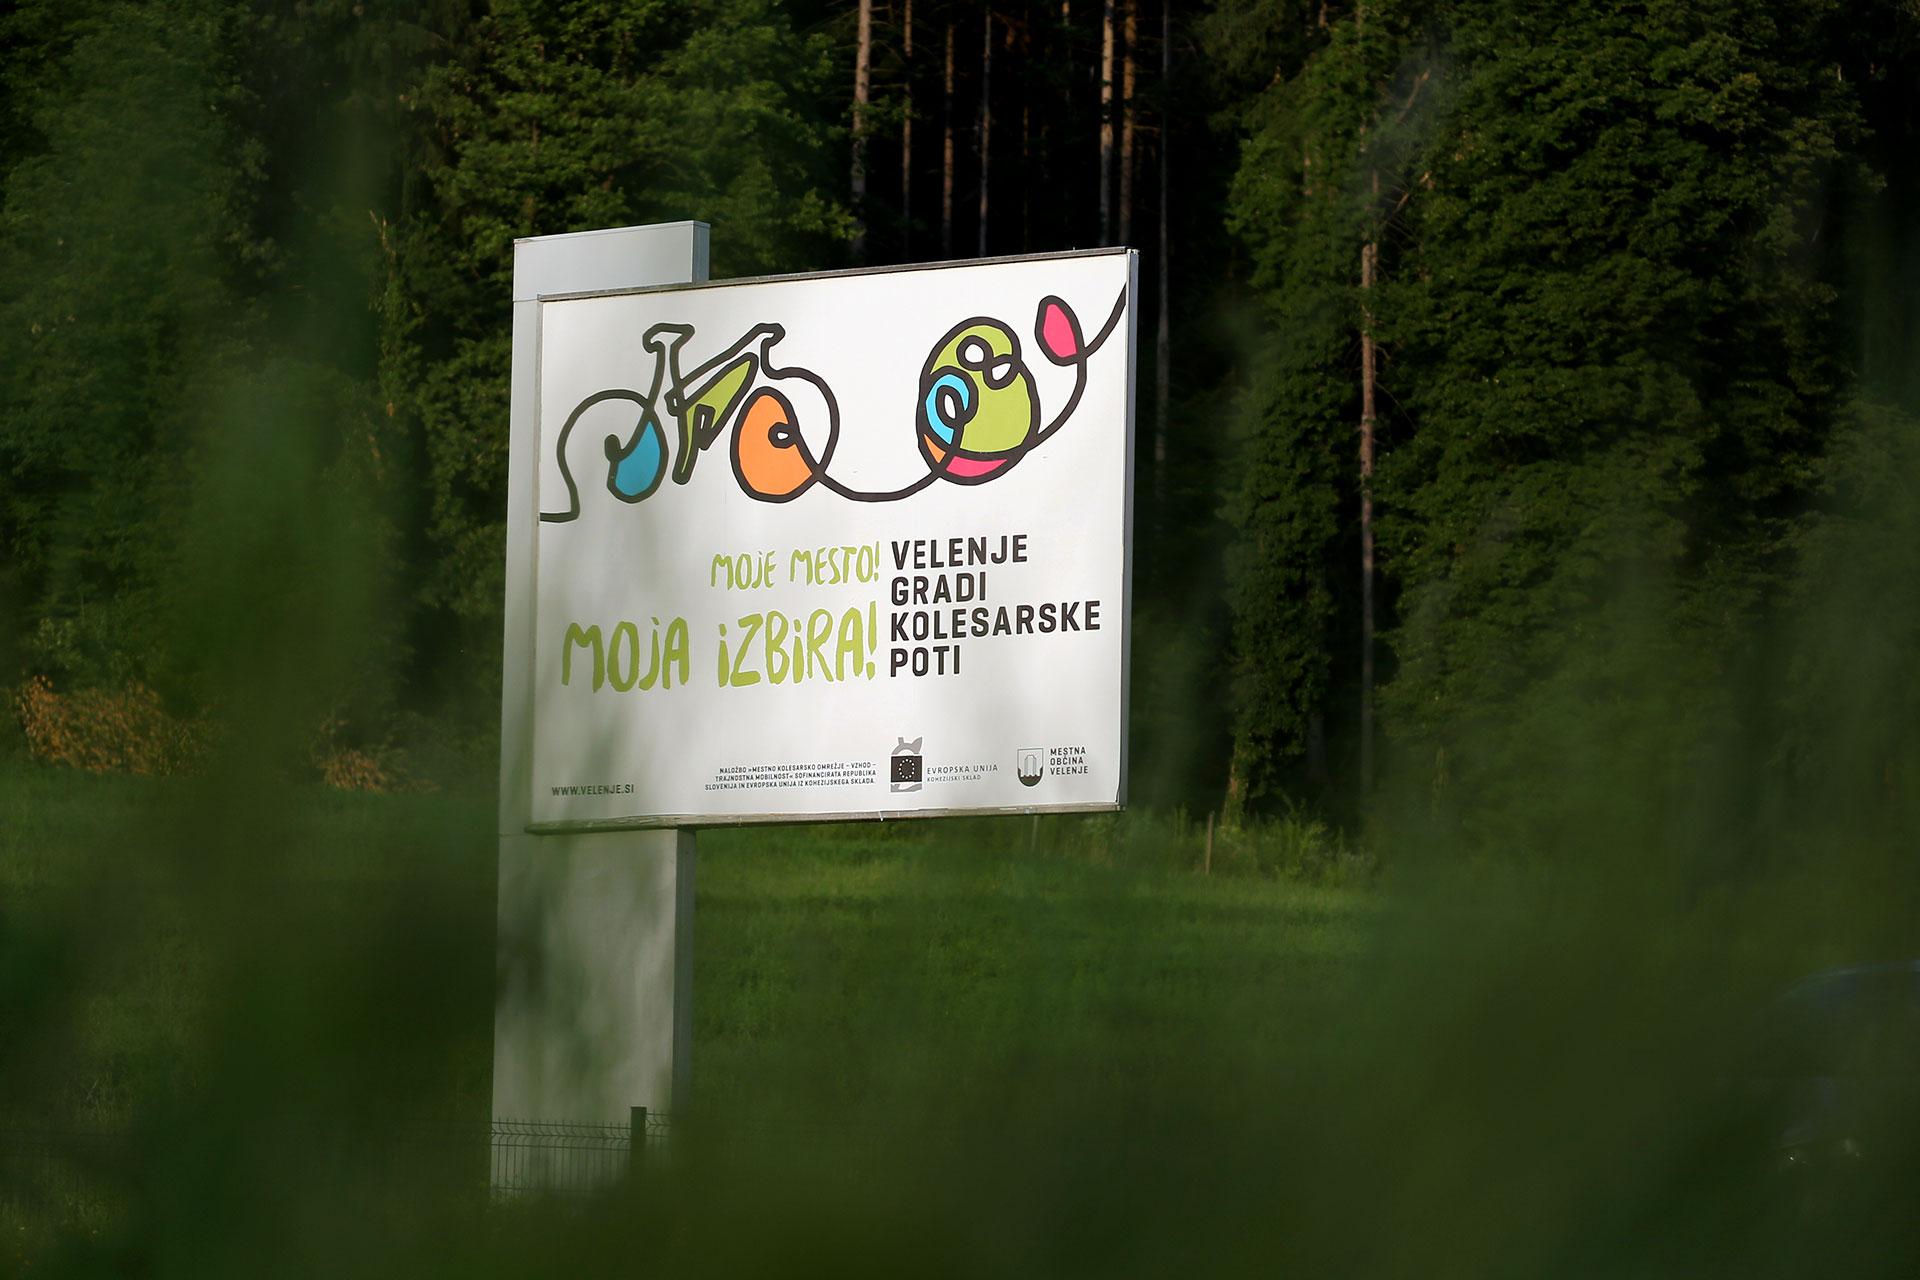 moje_mesto_kolesarske-obcina_velenje-jumbo_vizualna_podoba_marko_marinsek_ma-ma_studio__19_3